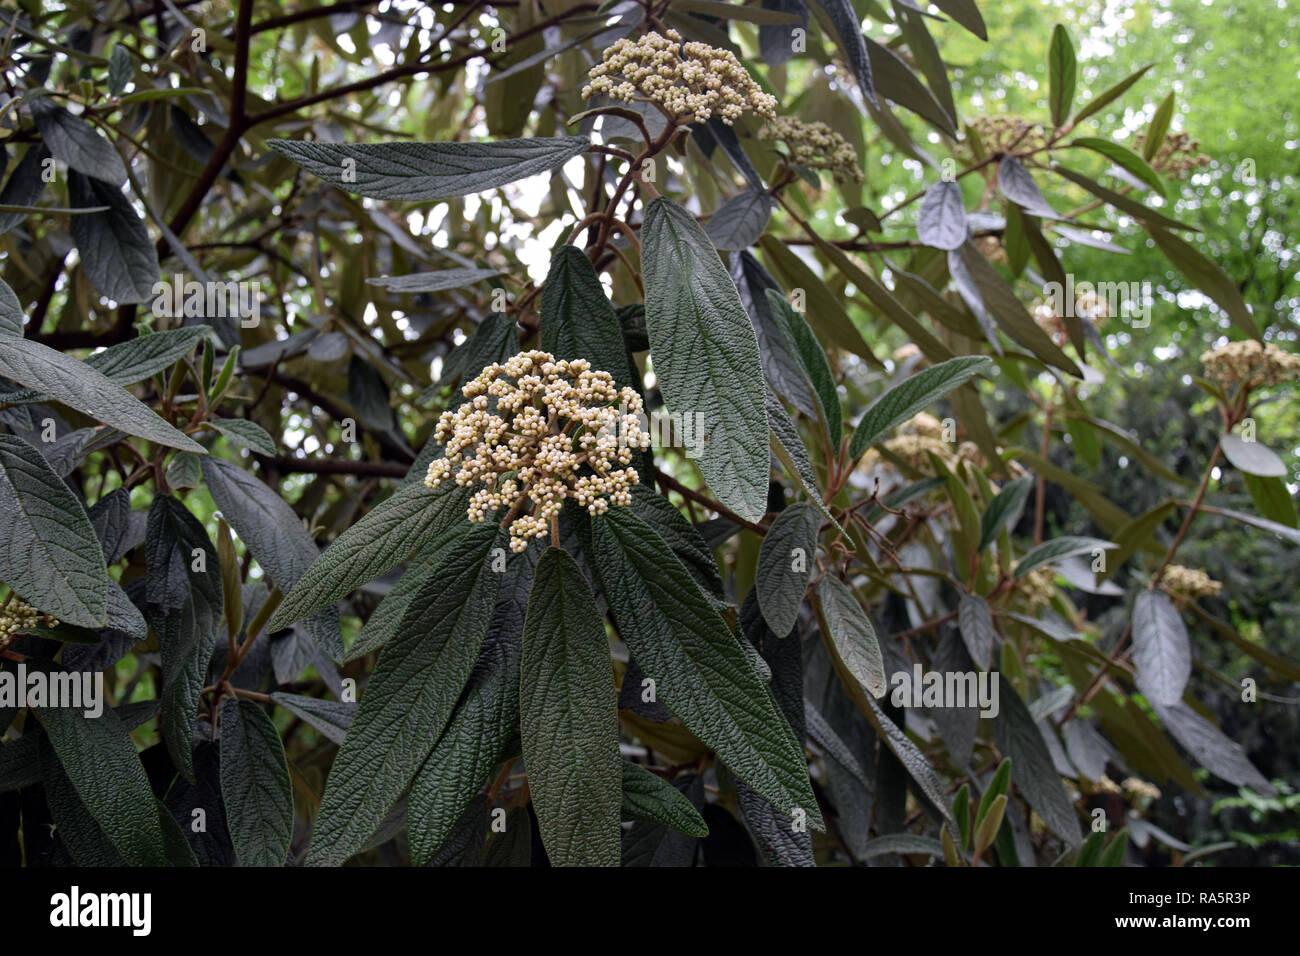 Viburnum rhytidophyllum (leatherleaf viburnum). Decorative shrub from Asia. - Stock Image